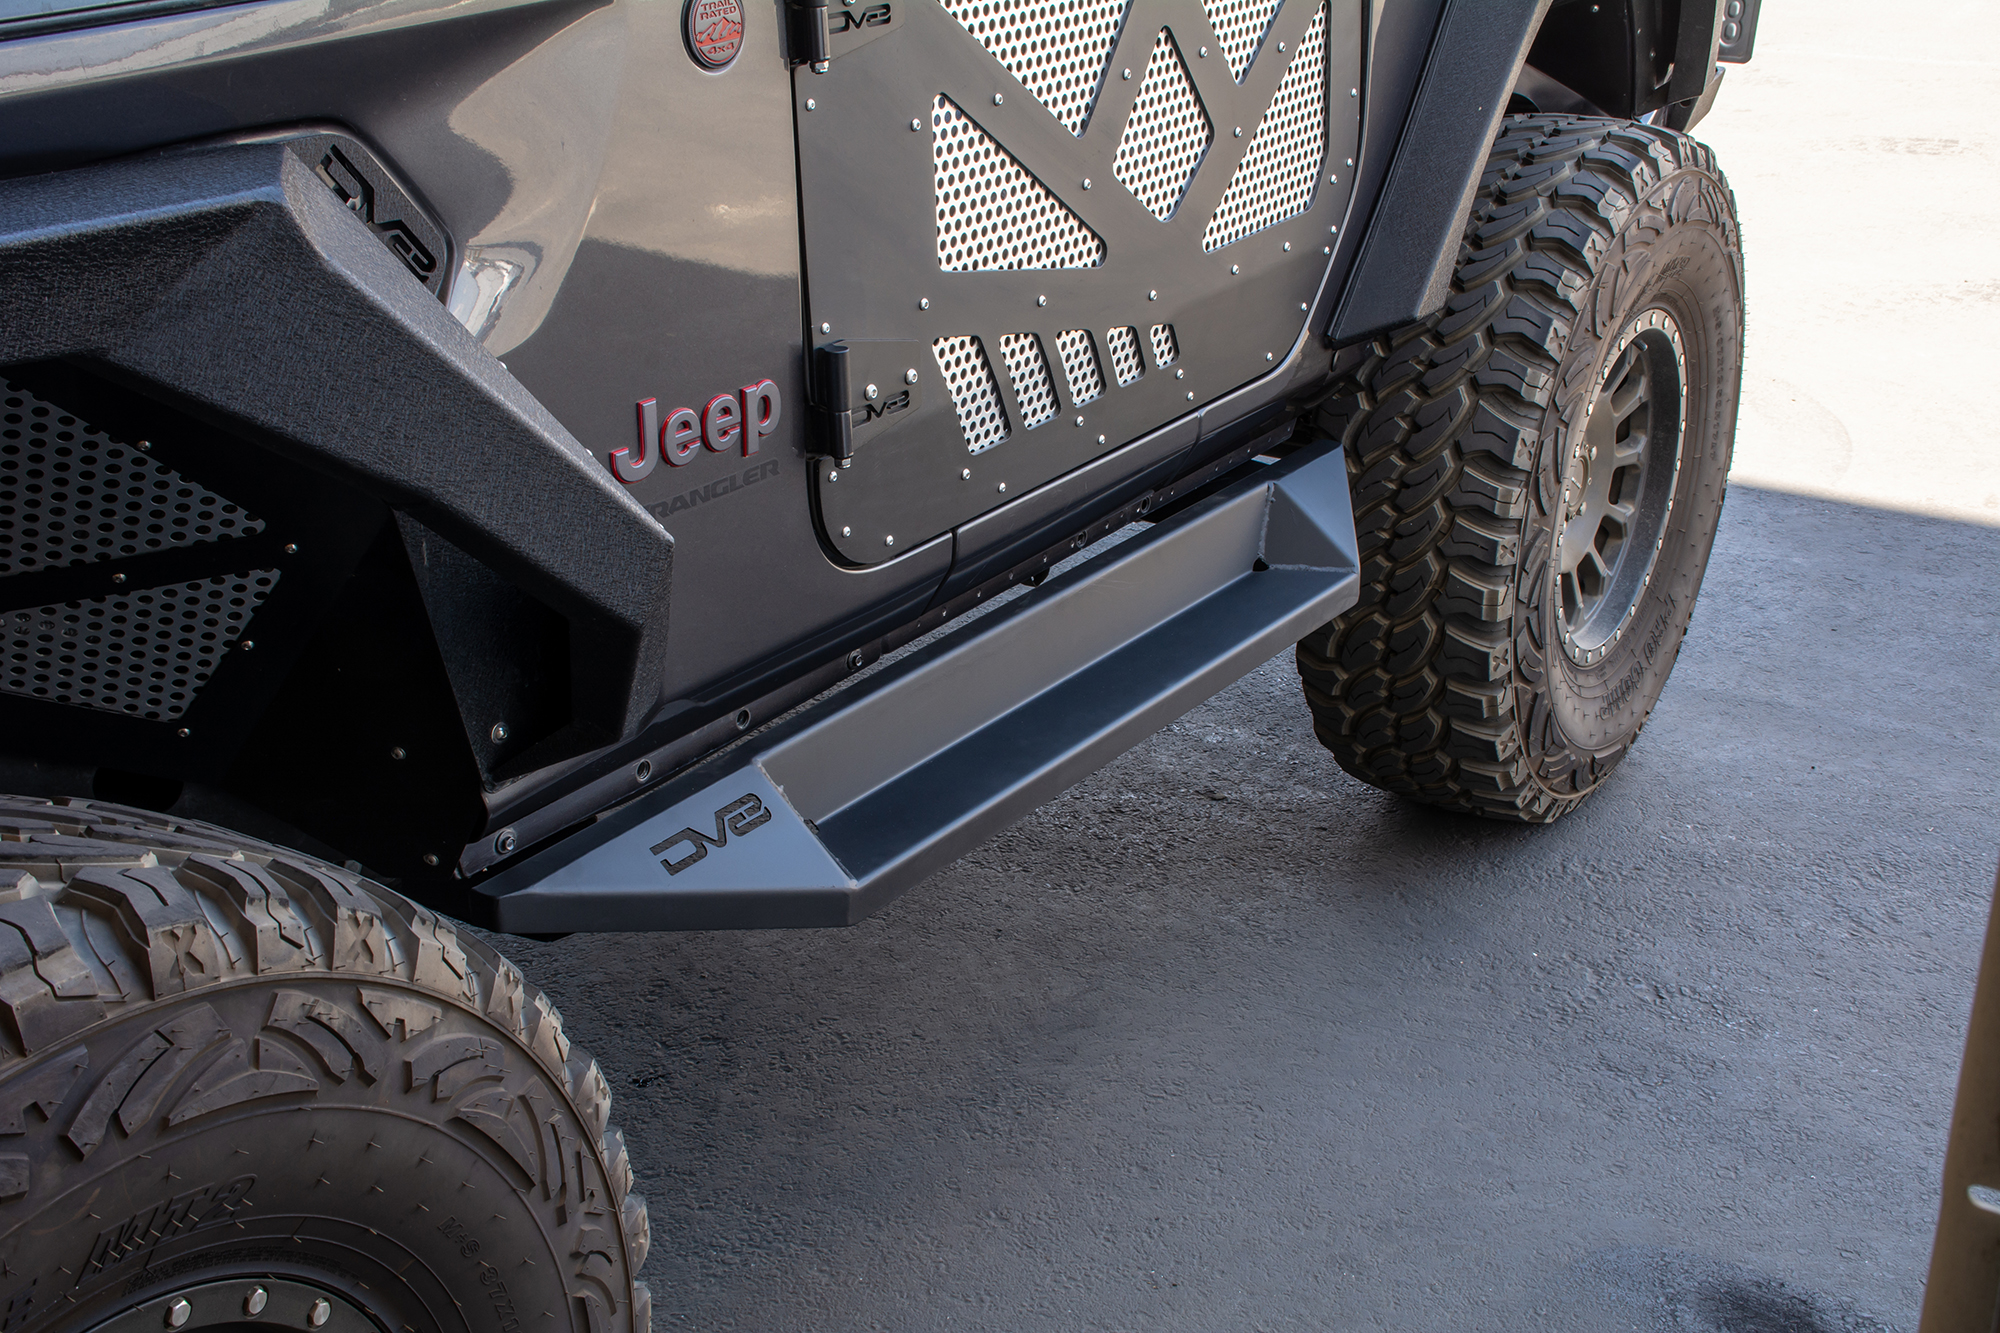 Jeep JL Boxed Slider/ Step 18-Present Jeep Wrangler JL 2 Door DV8 Offroad